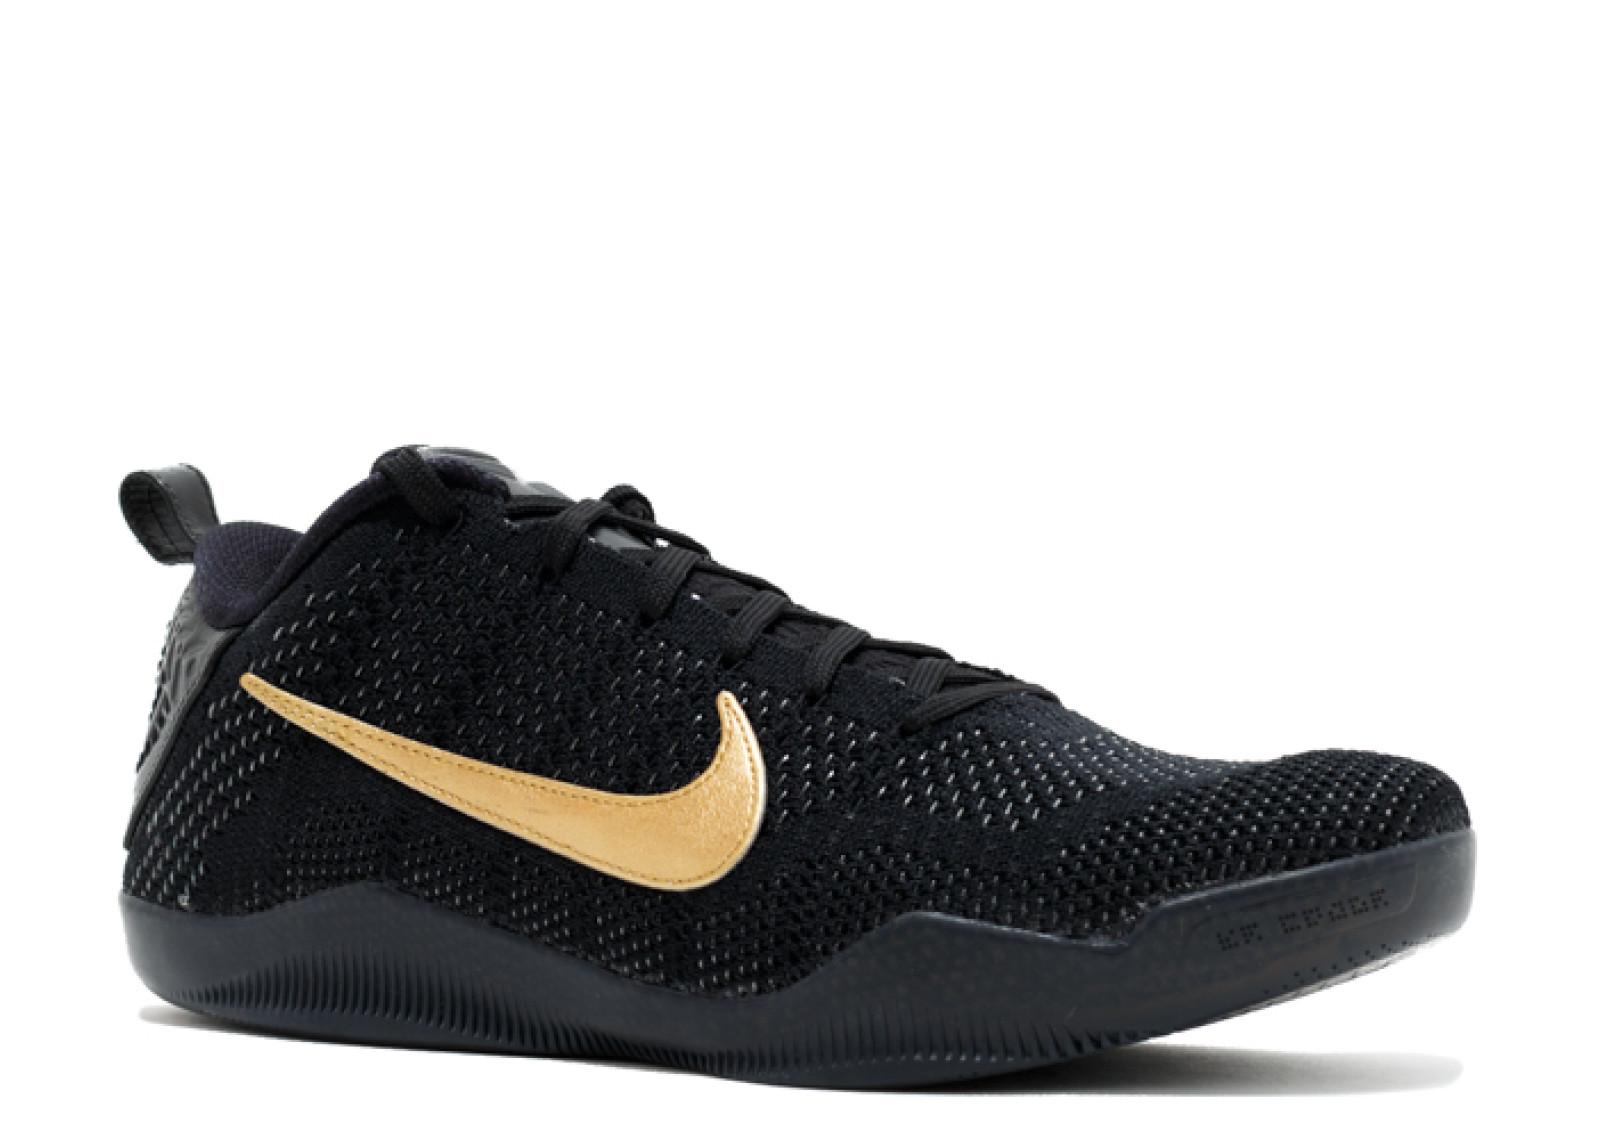 best service 2e7ff fca70 Nike Kobe 11 Elite Low Black Mamba Collection Fade to Black - 1